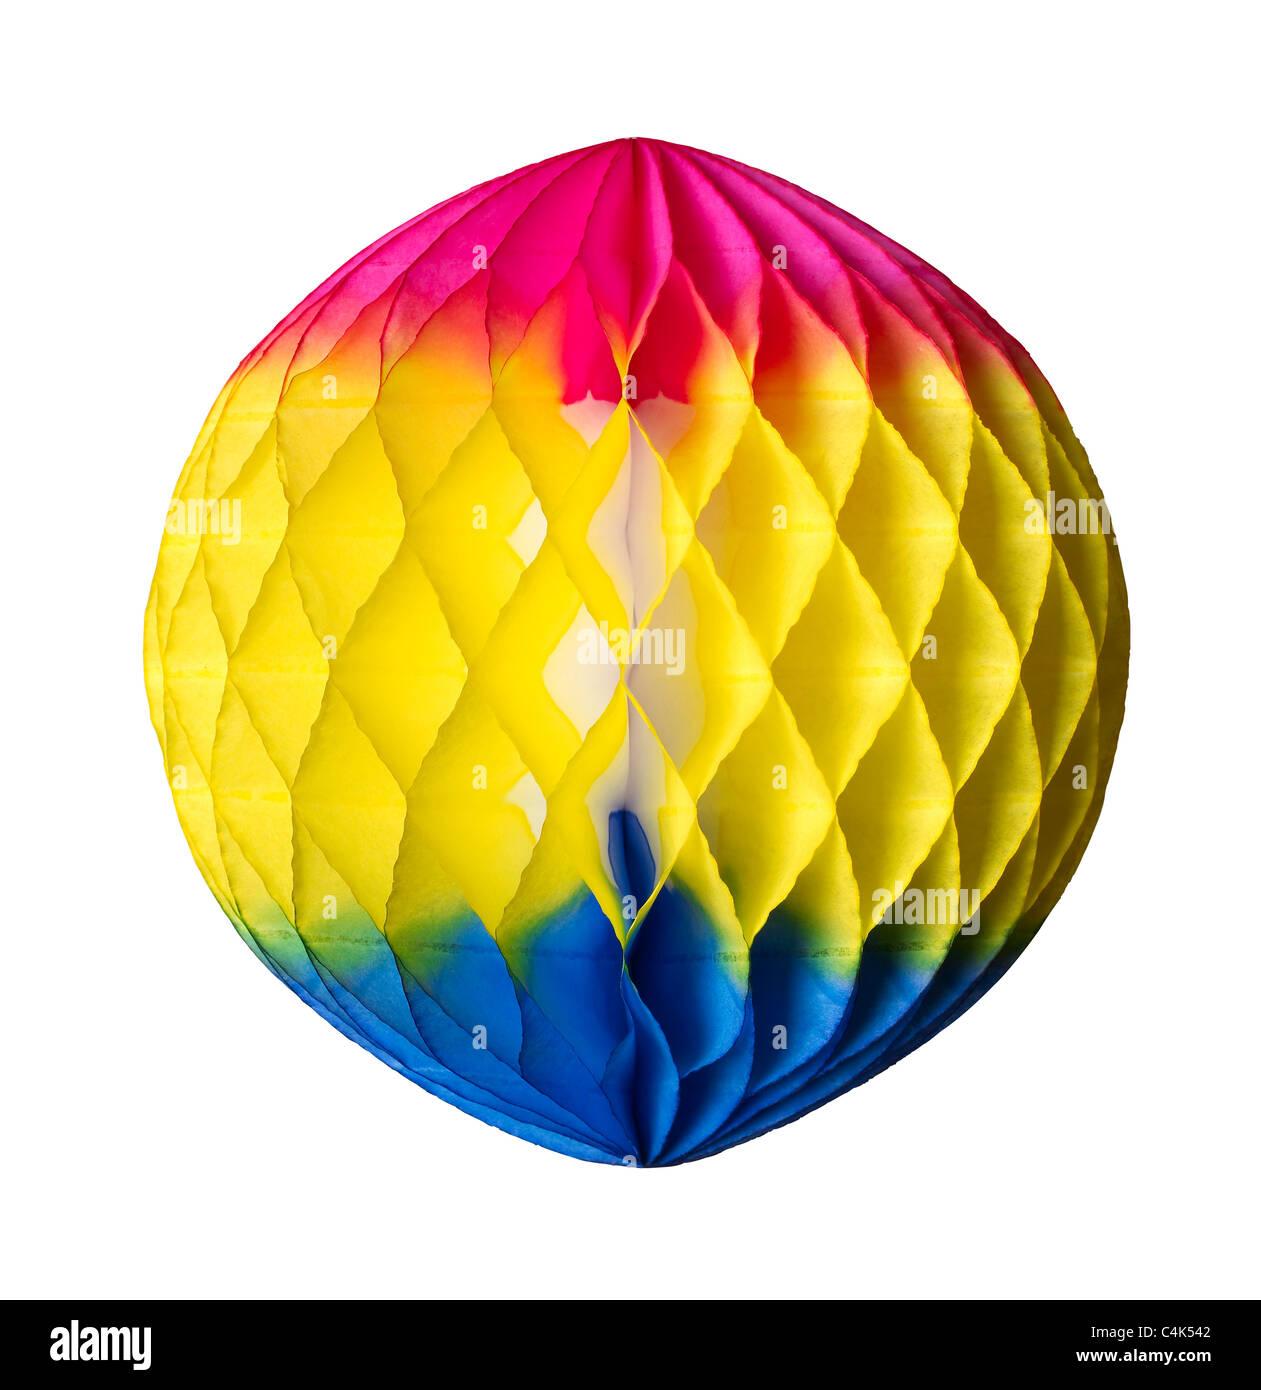 Globe paper ornament - Stock Image